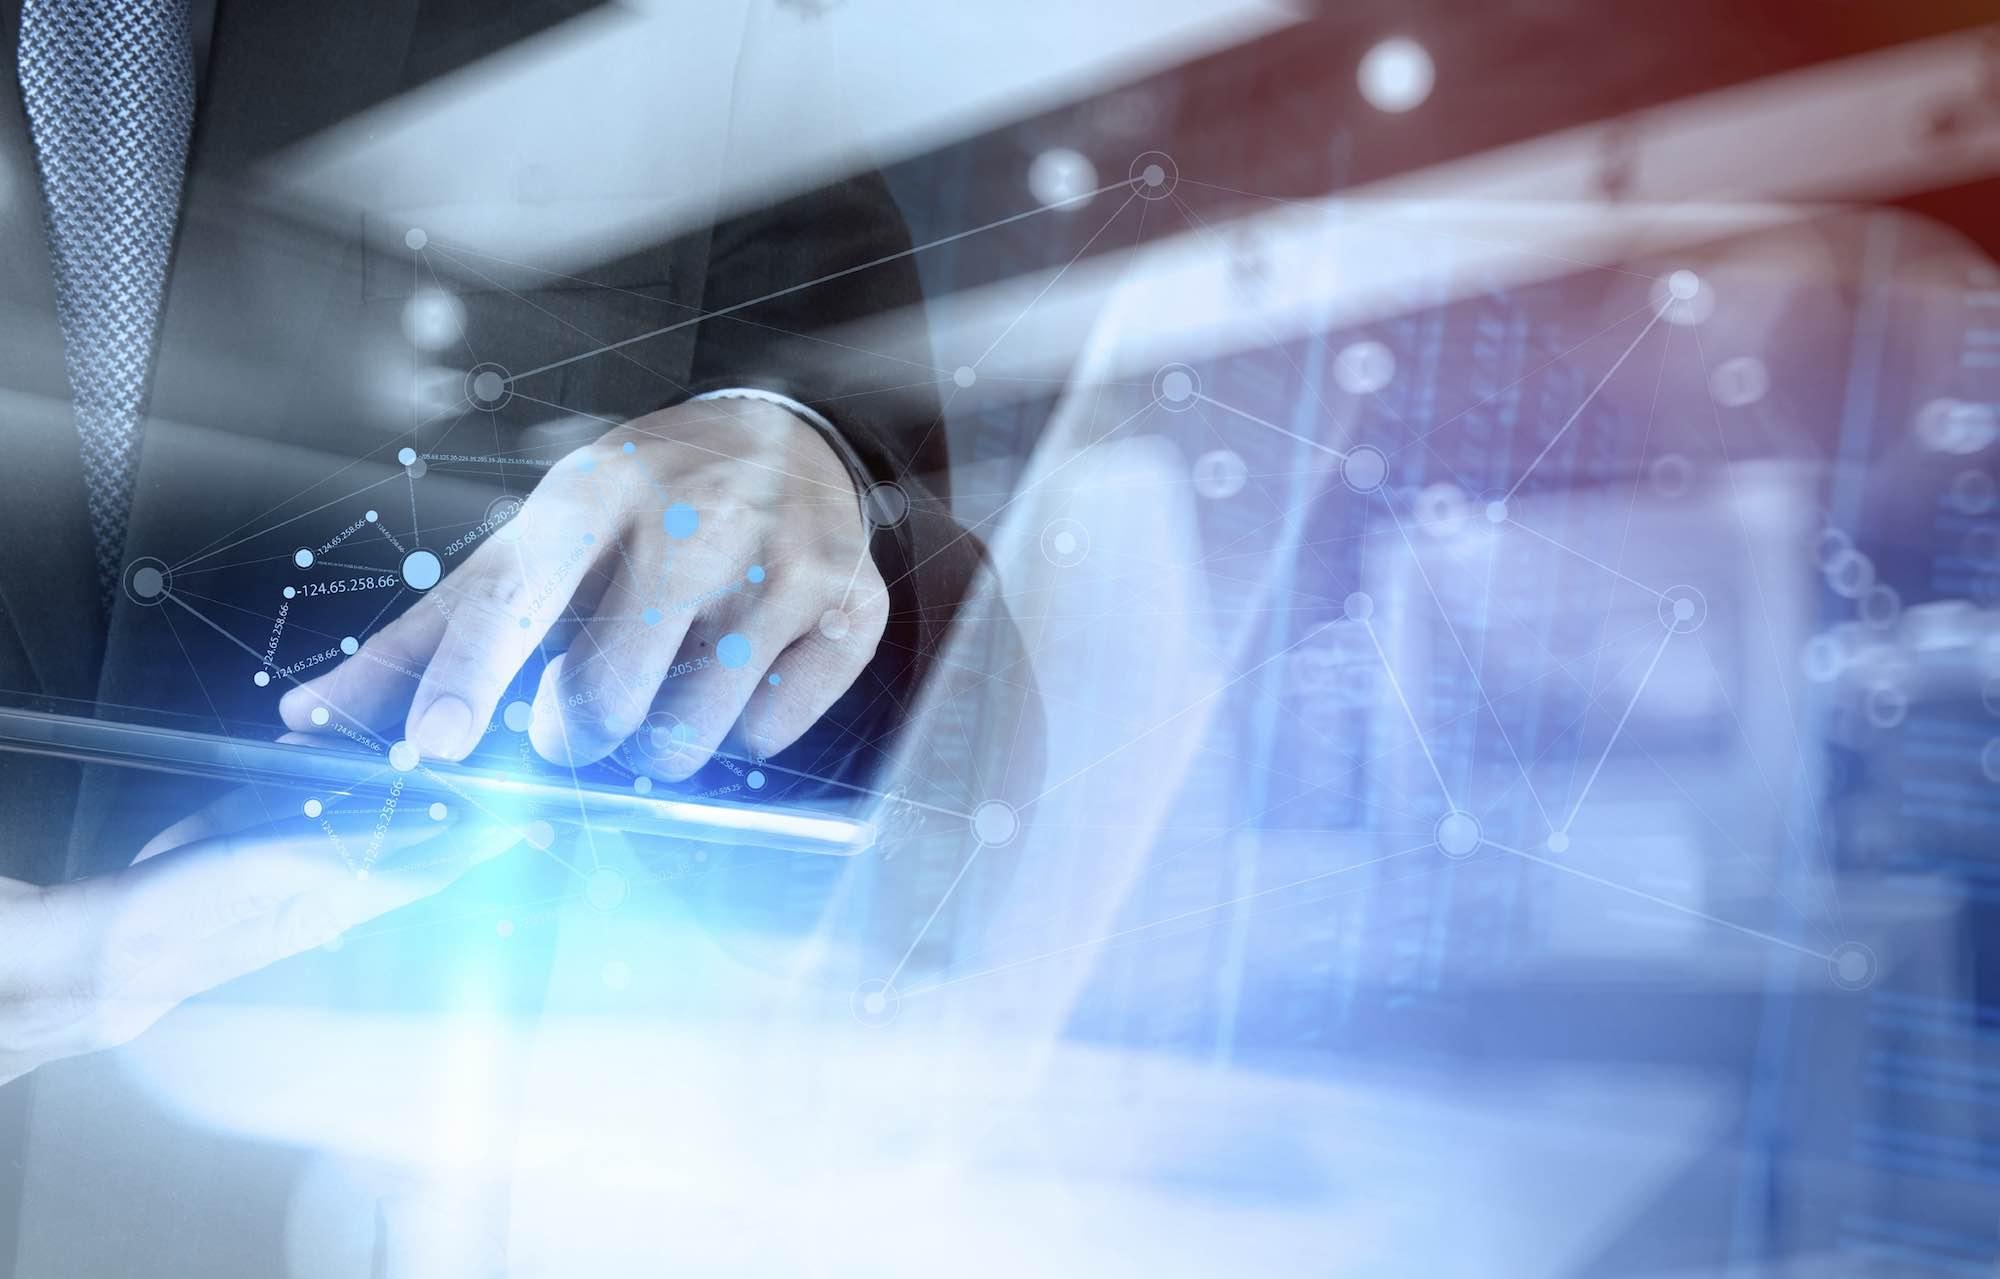 All-Flash Versus Hybrid VMware Virtual SAN™: Performance vs. Price